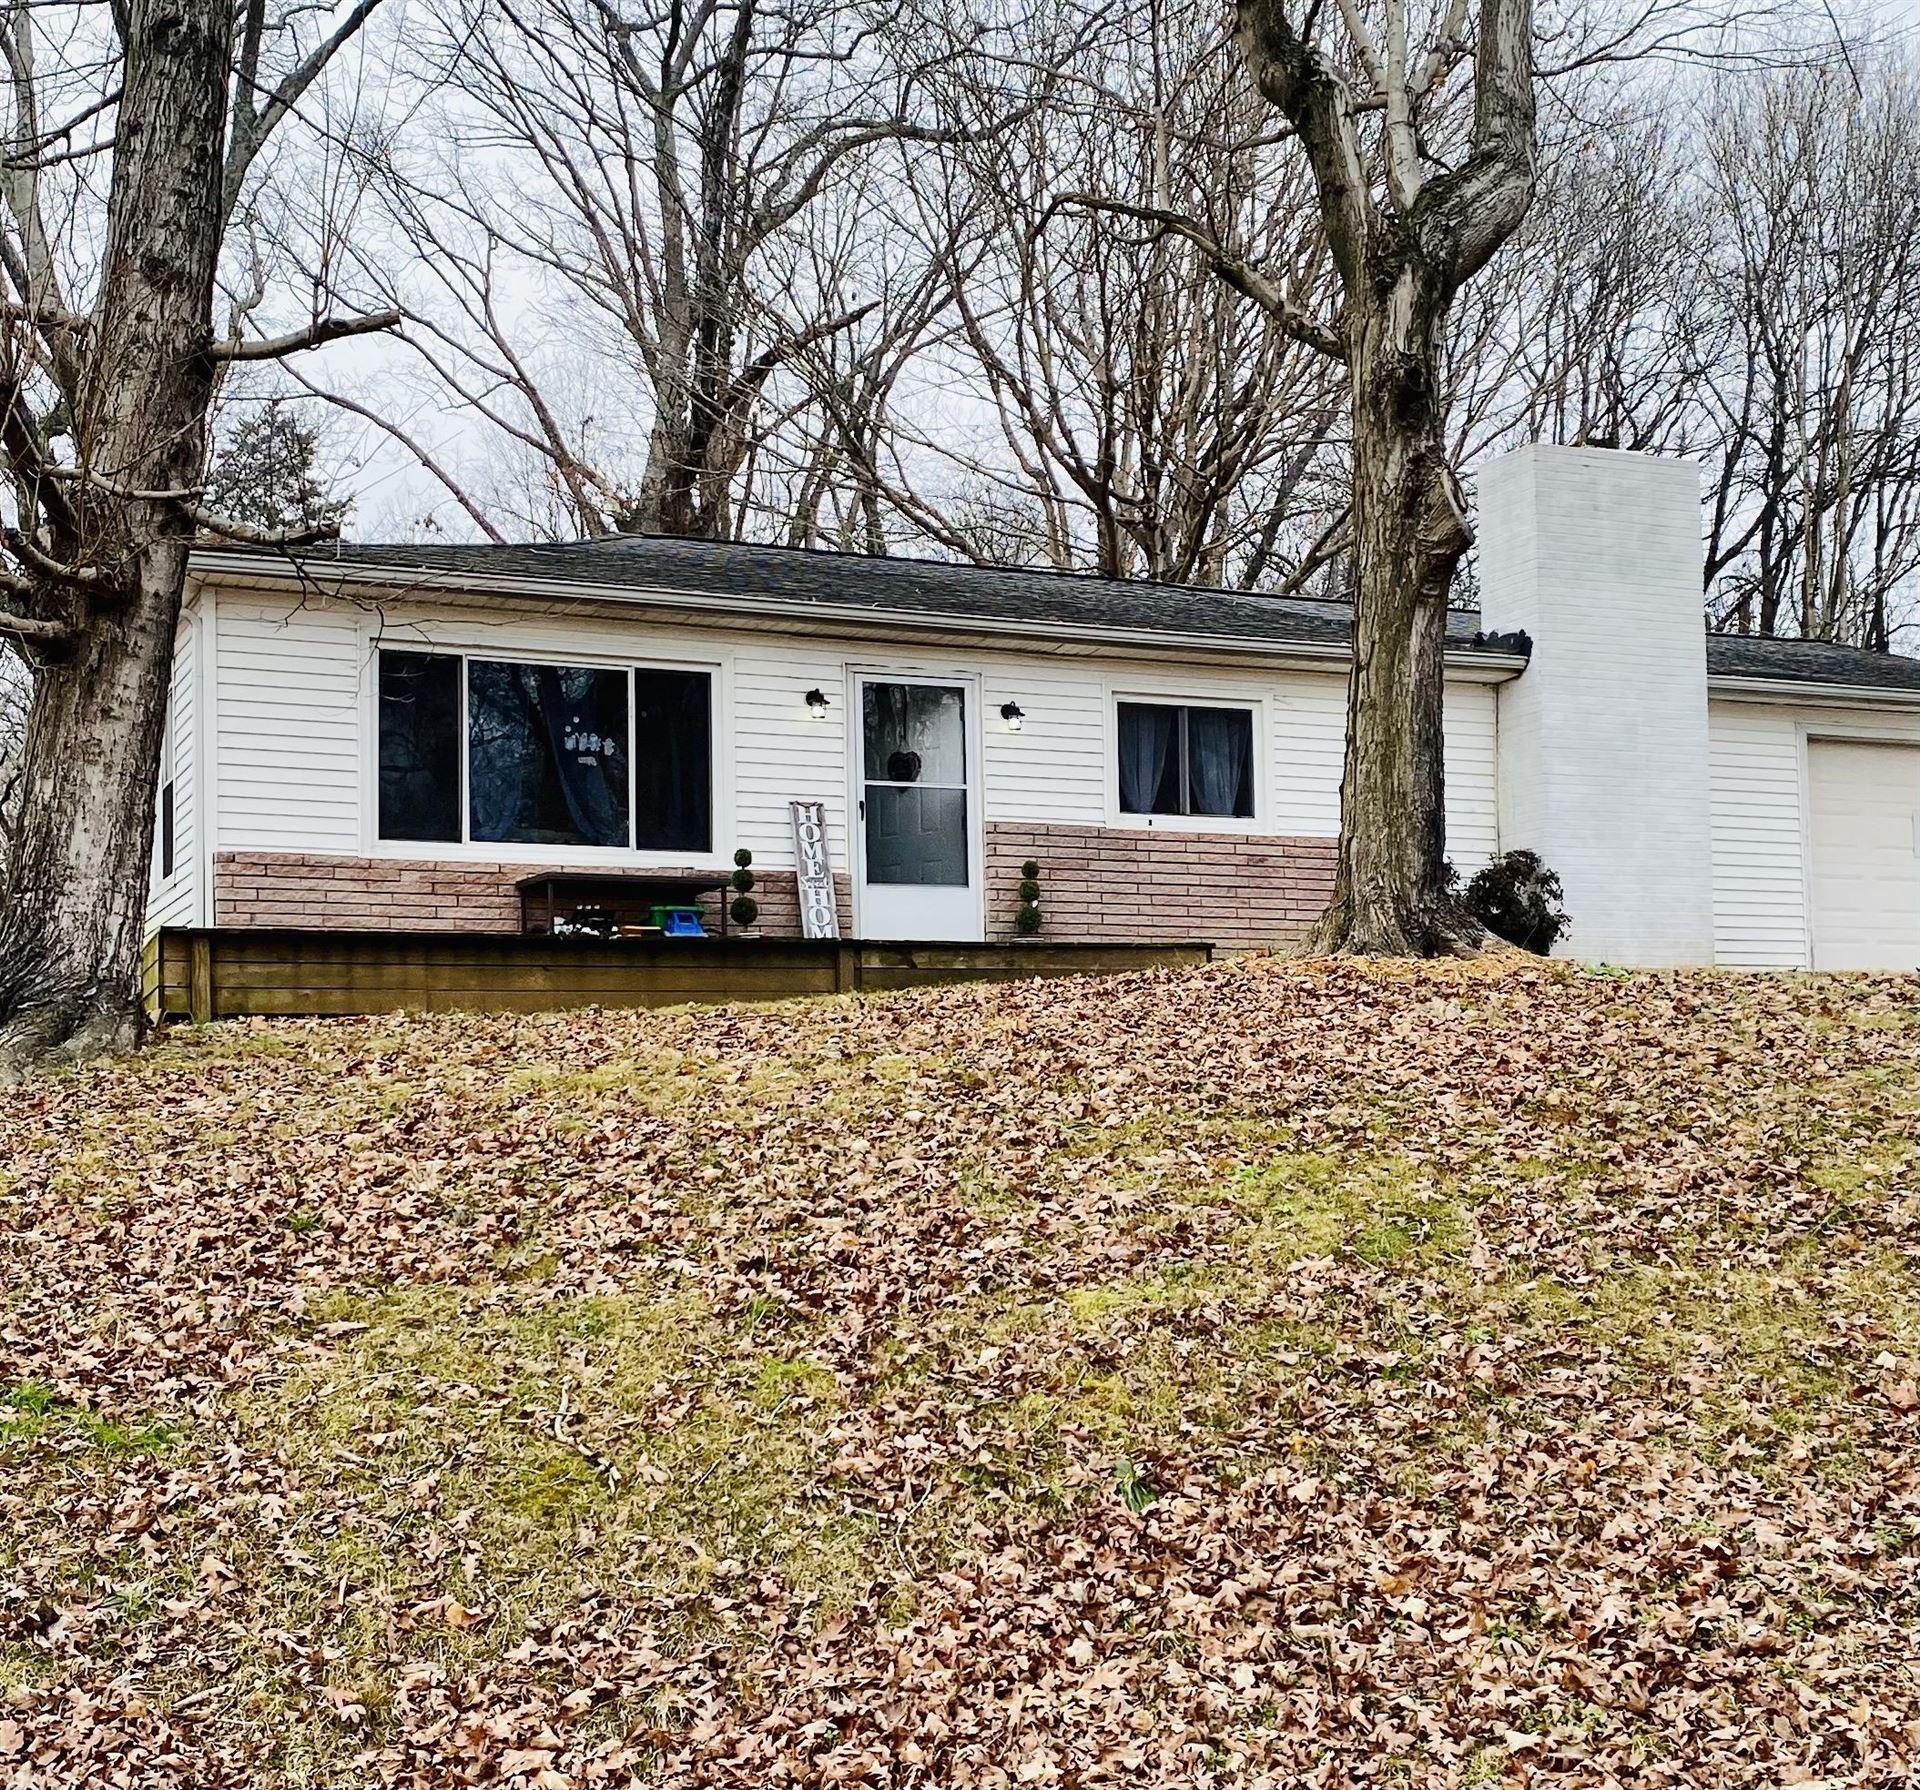 Photo of 151 Pine St, Loudon, TN 37774 (MLS # 1139919)